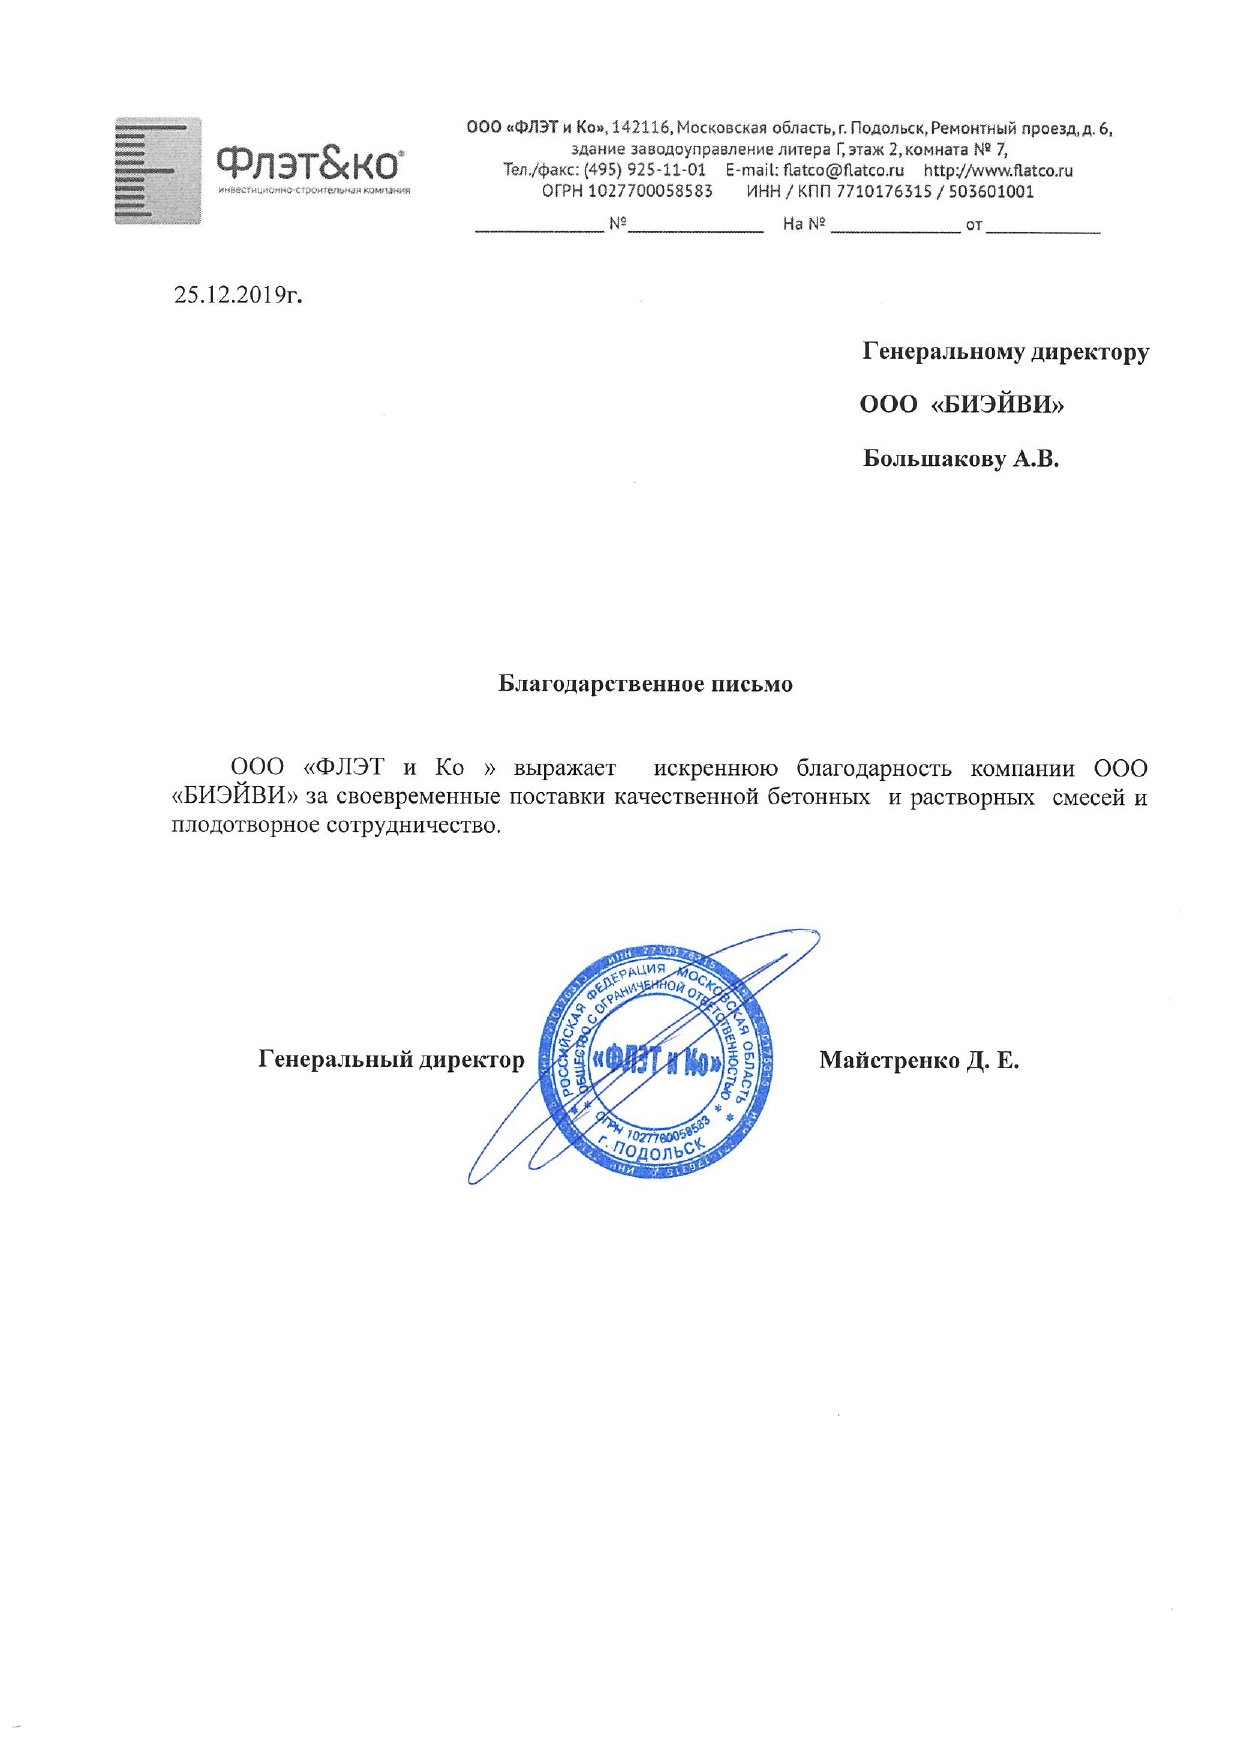 Биэйви москва бетон куплю бетон домодедовский район